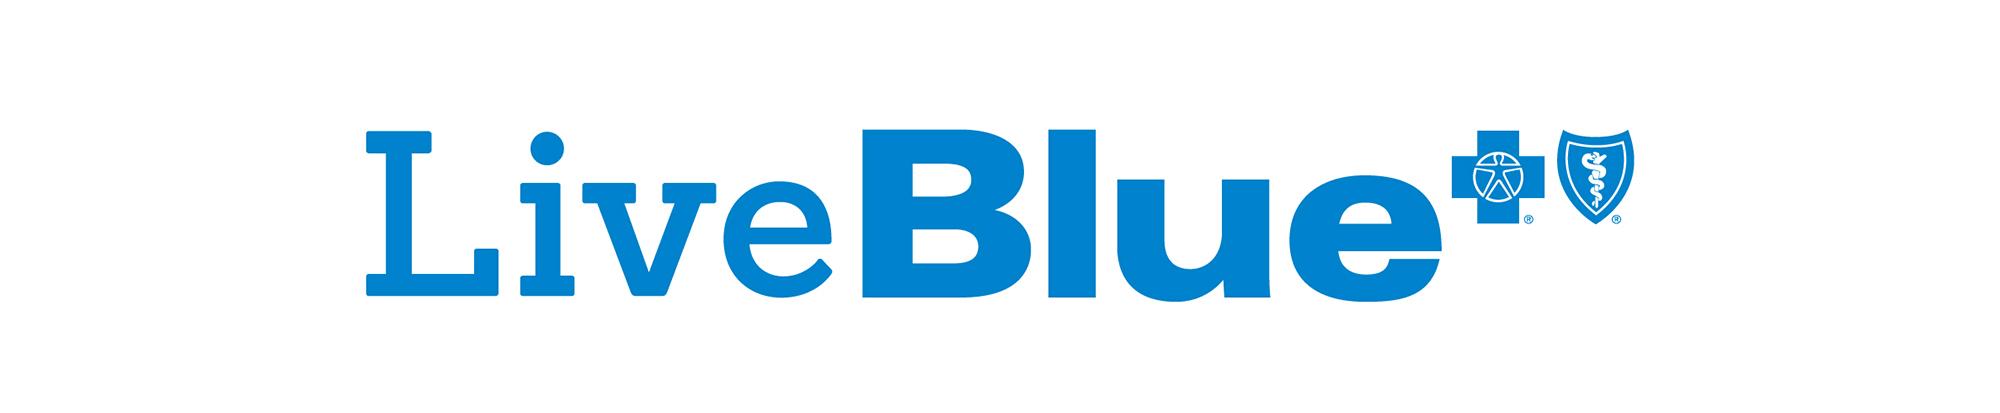 Live Blue